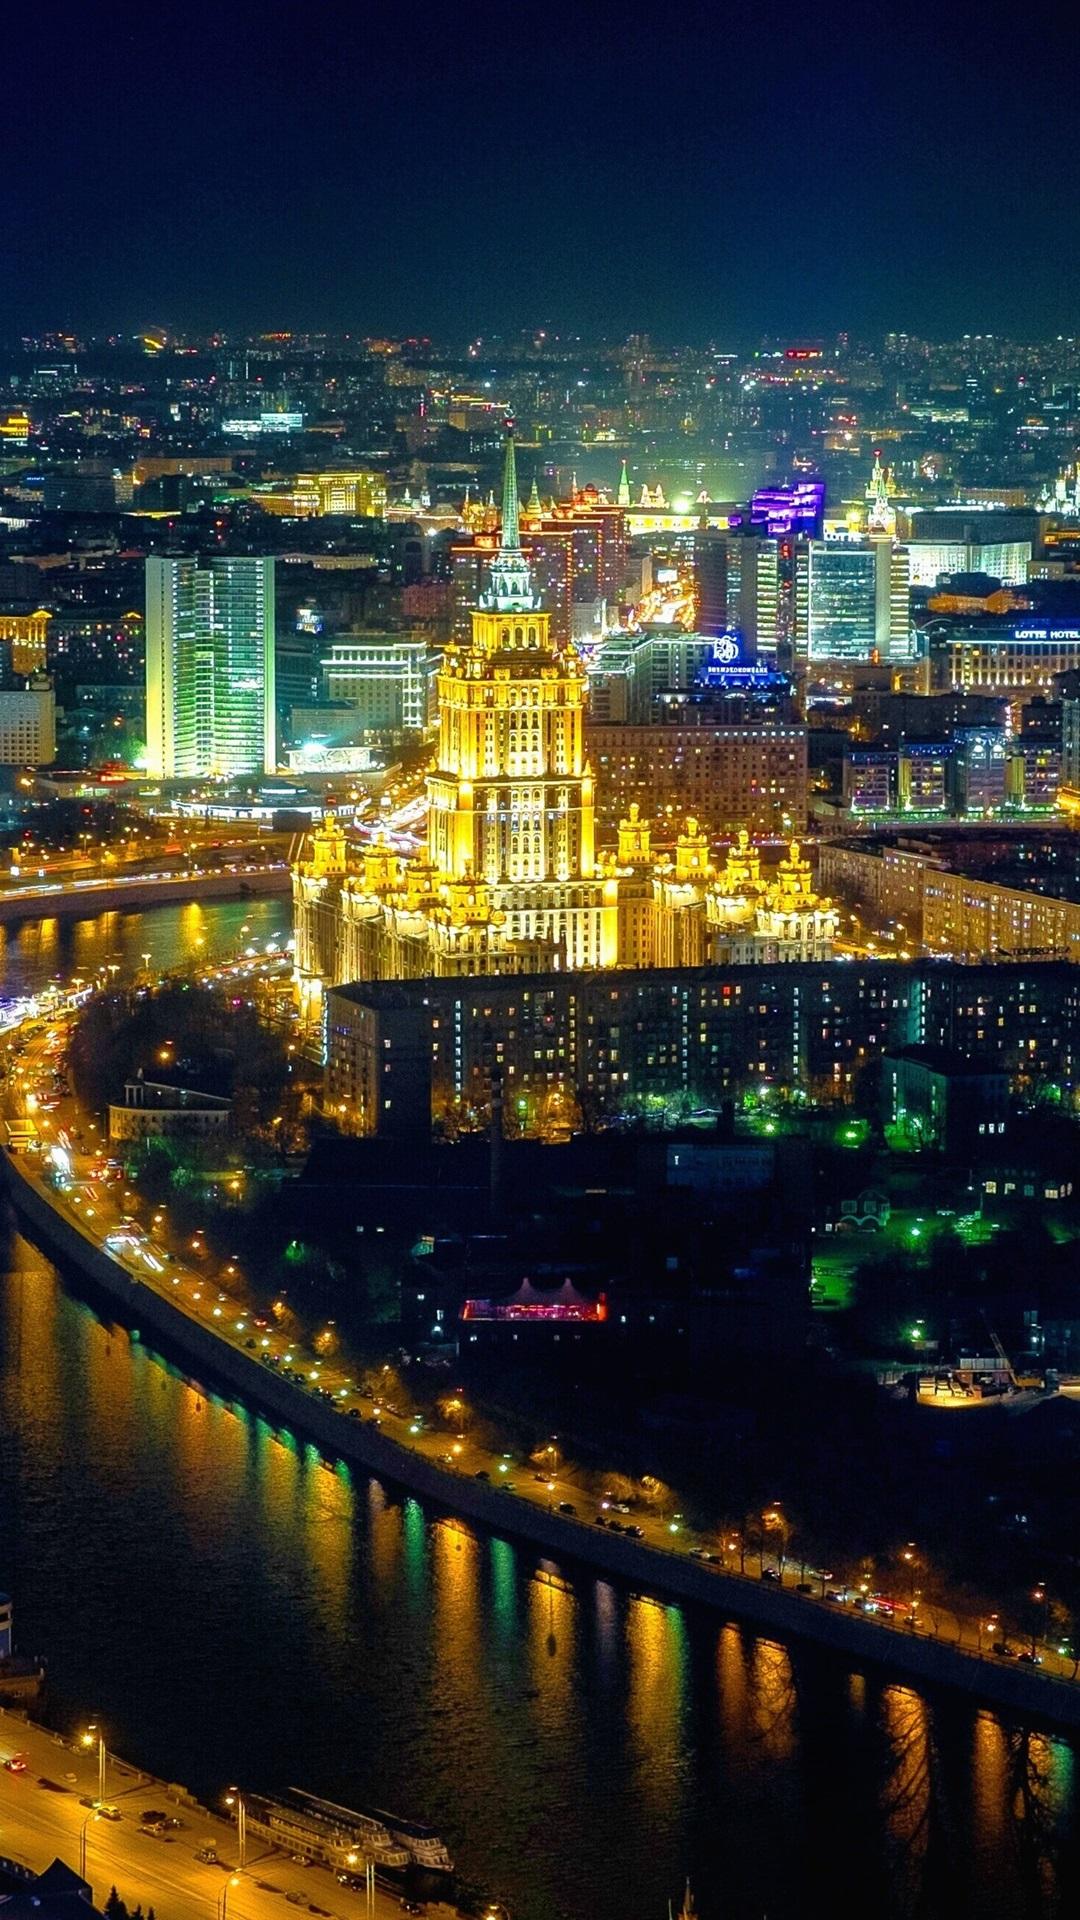 Moscow City Night Houses Illumination 1080x1920 Iphone 87